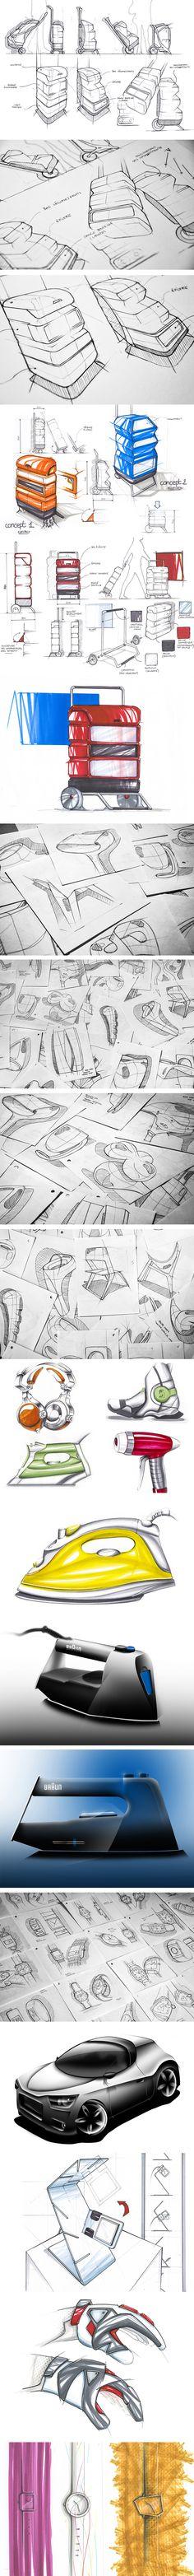 Sketches par Paulin Giret #id #industrial #design #product #sketch